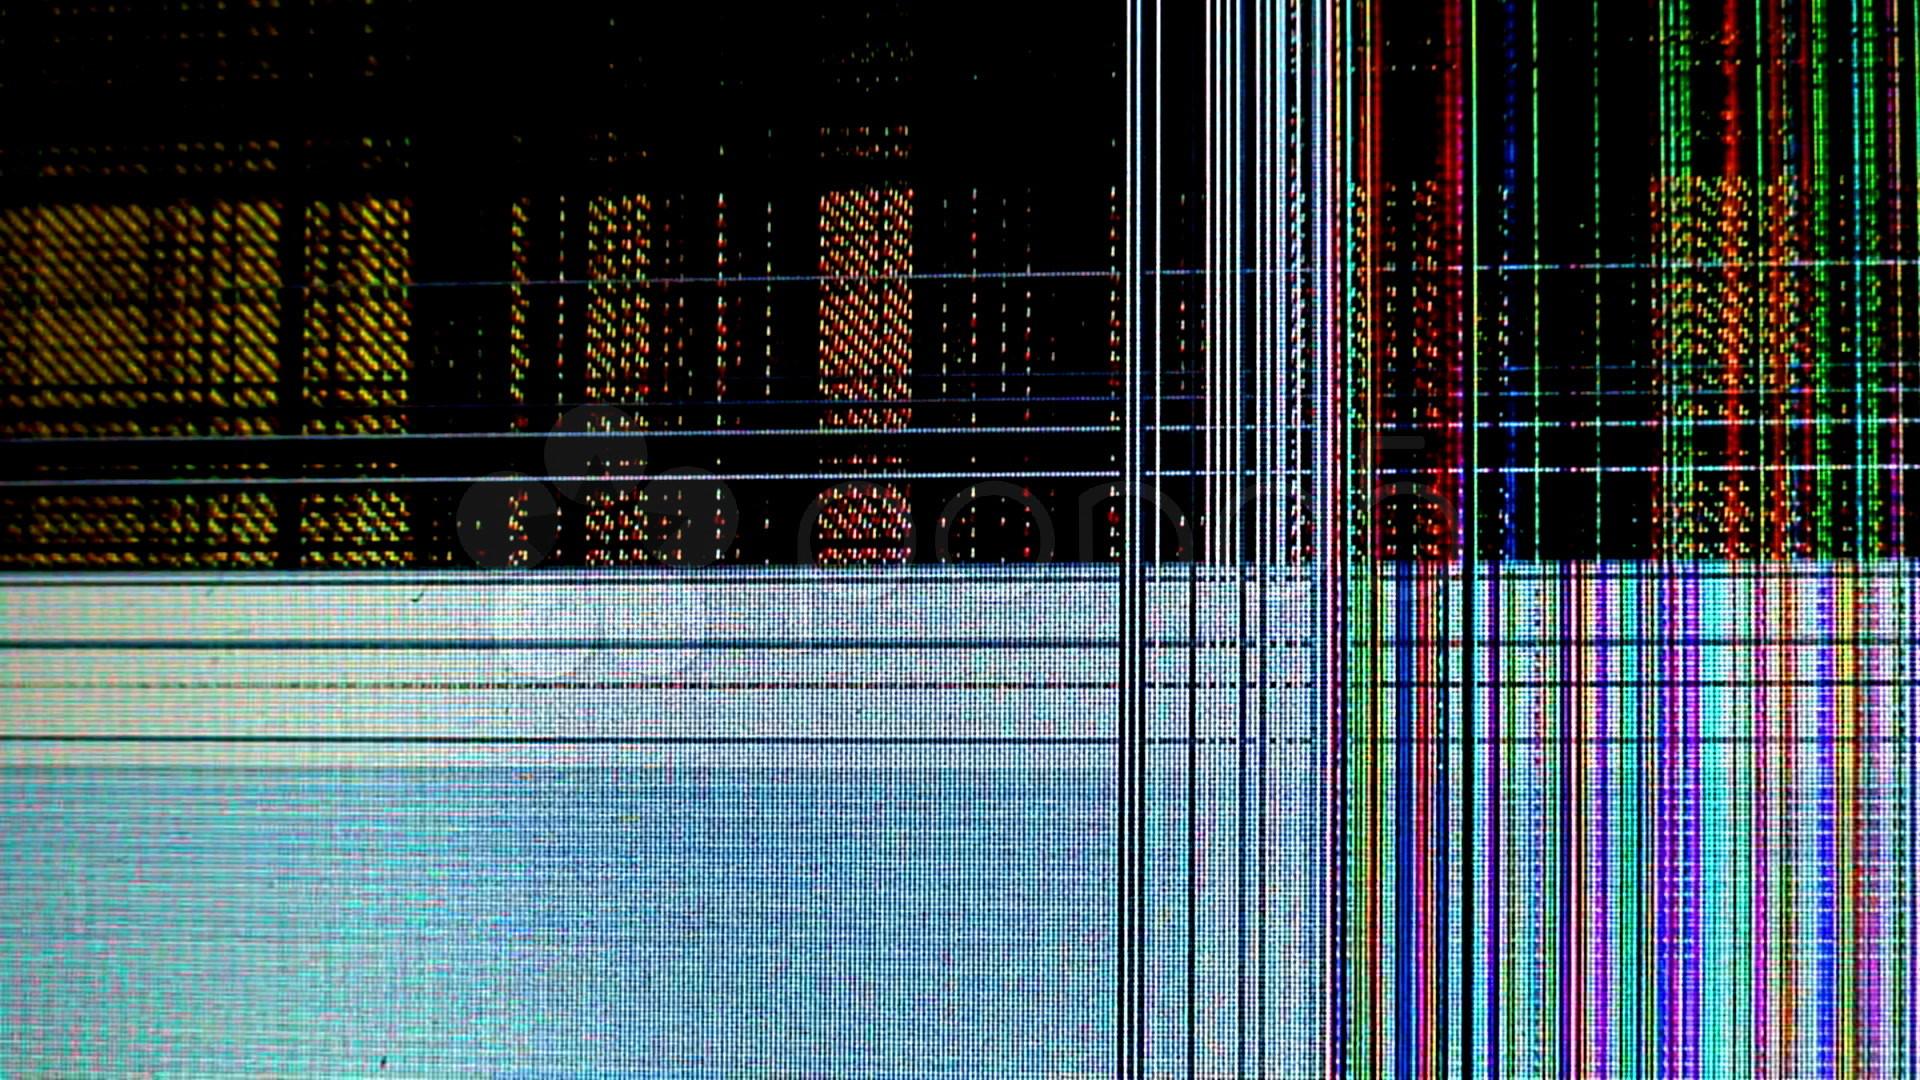 3d Cracked Screen Wallpaper 72 Images